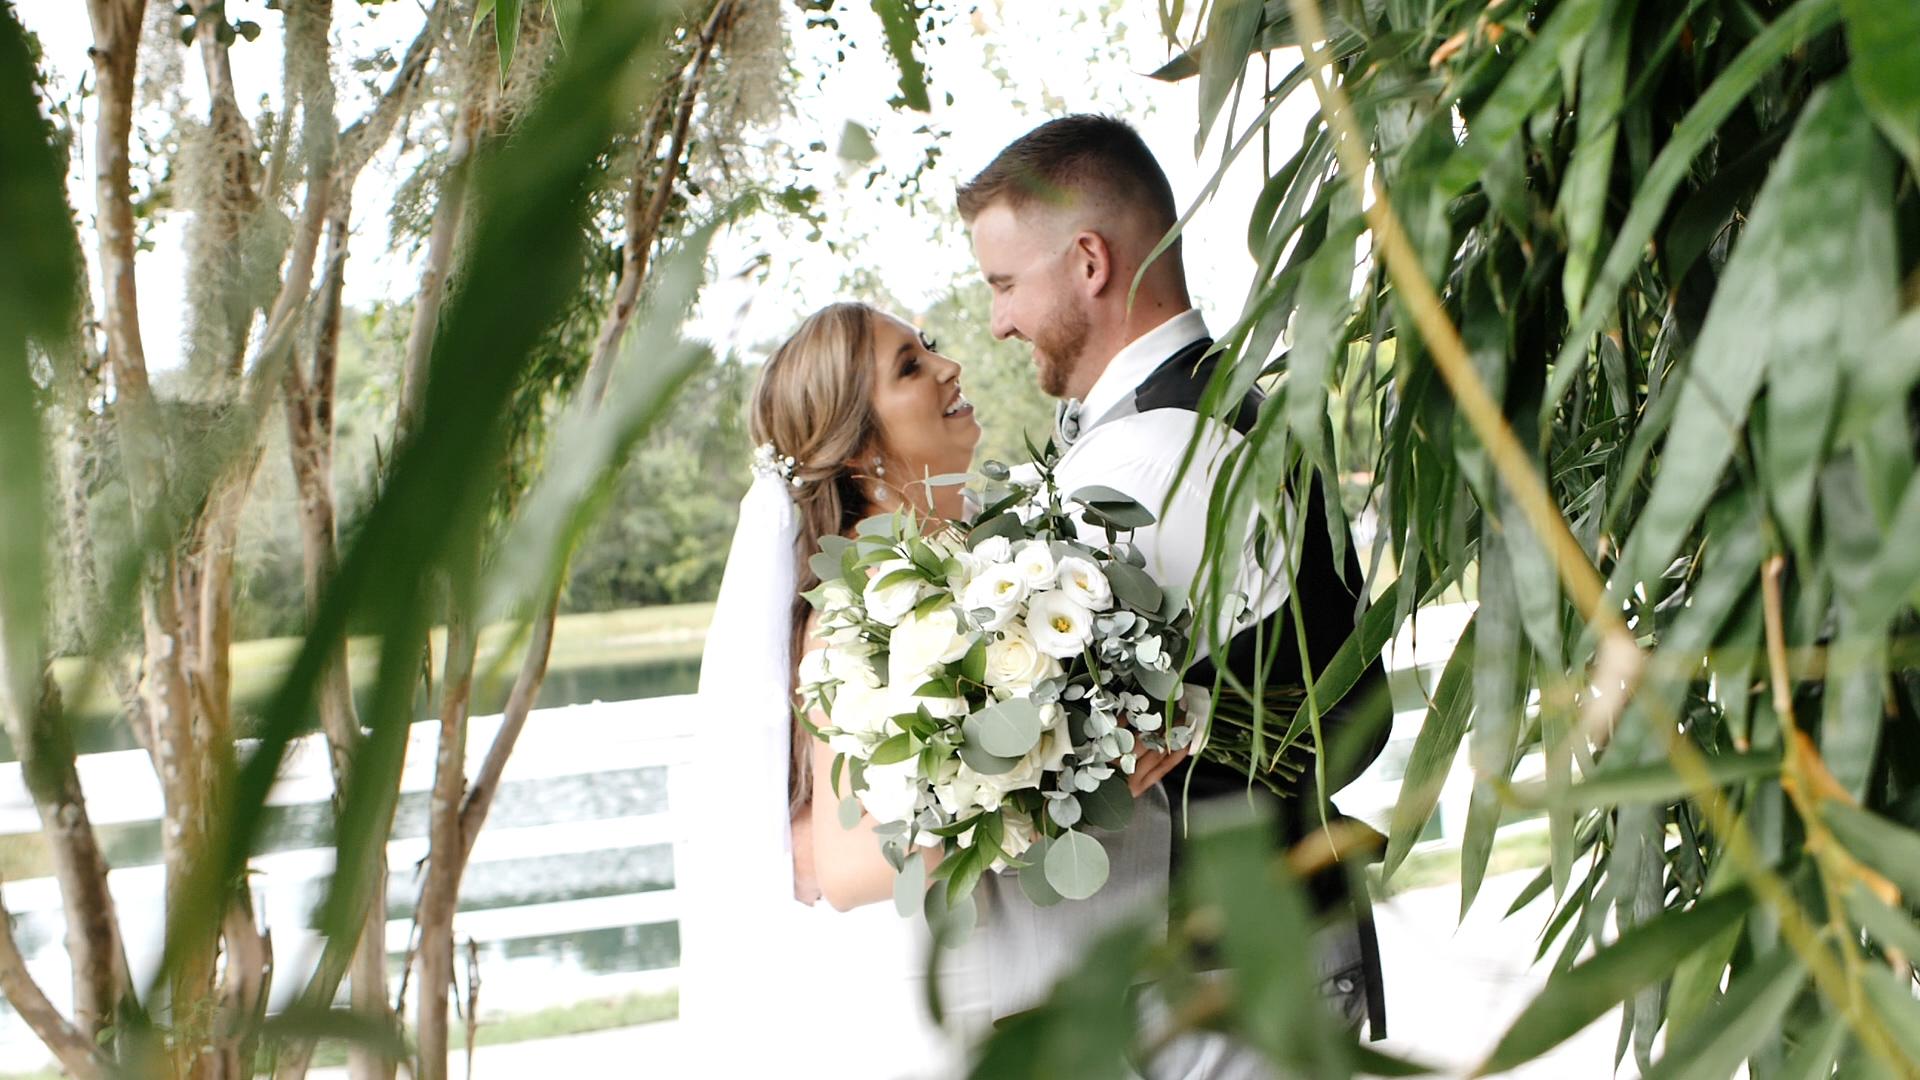 Jessica + Jeffery | Yulee, Florida | Laytn's Land-N